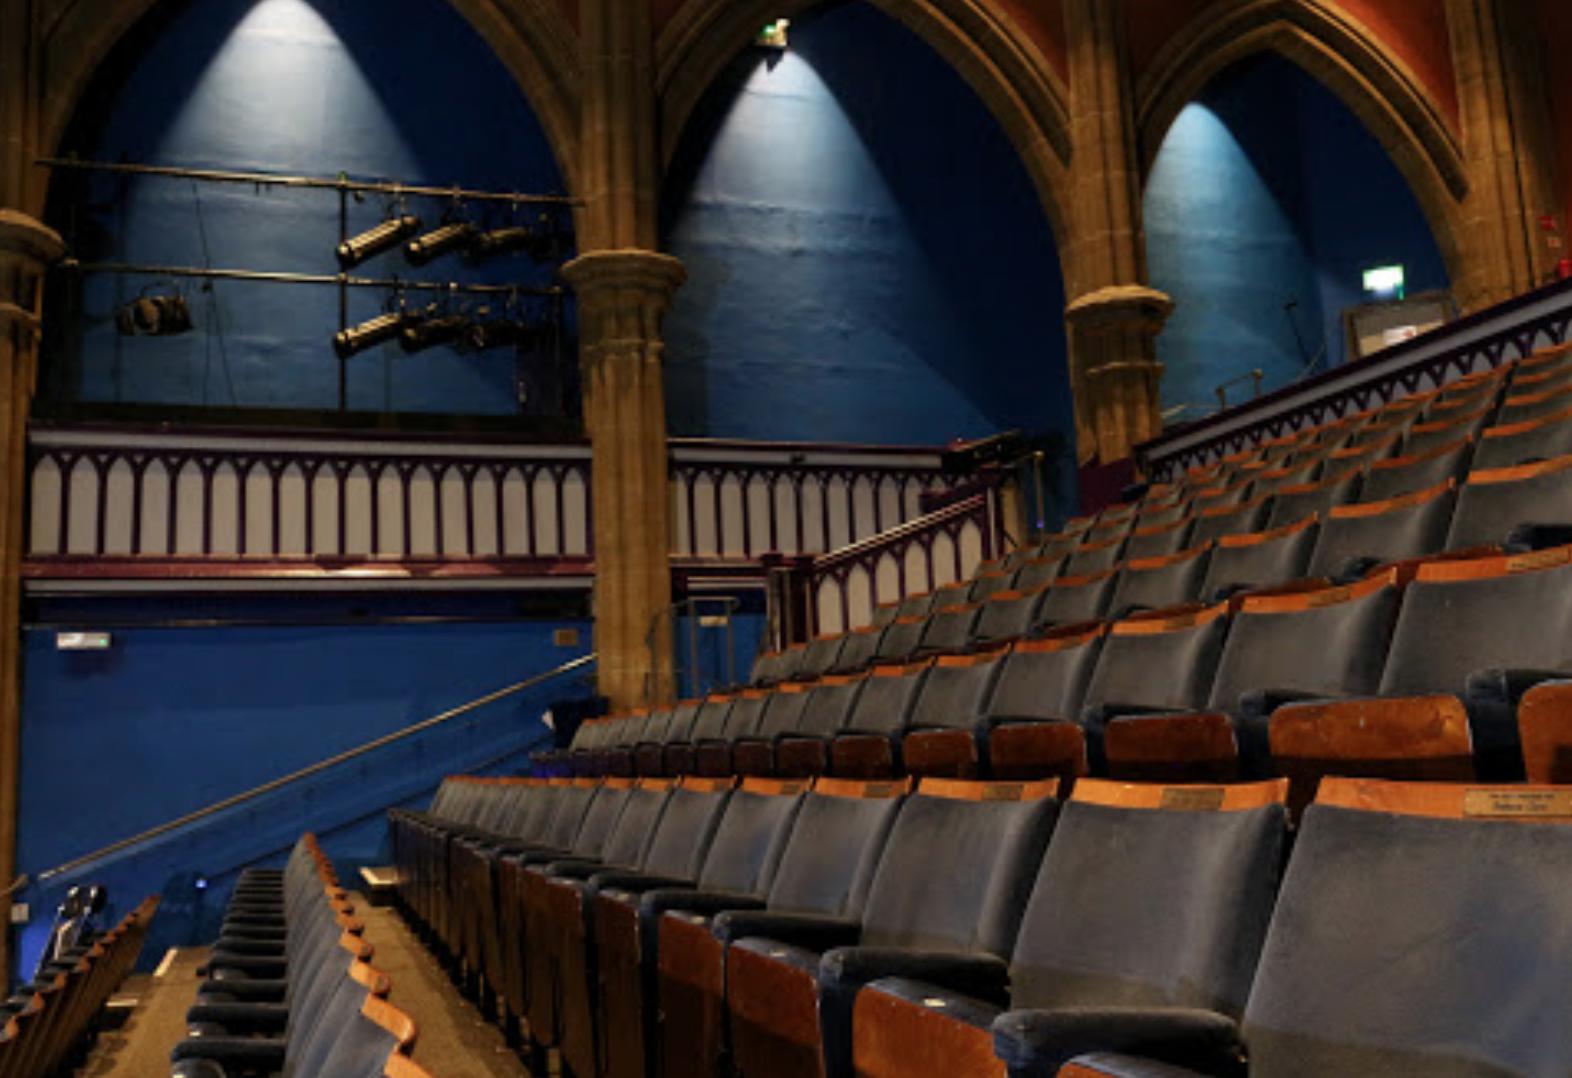 trinity-theatre-tunbridge-wells-kent-support-local-magazine-stockist-music-show-film.png